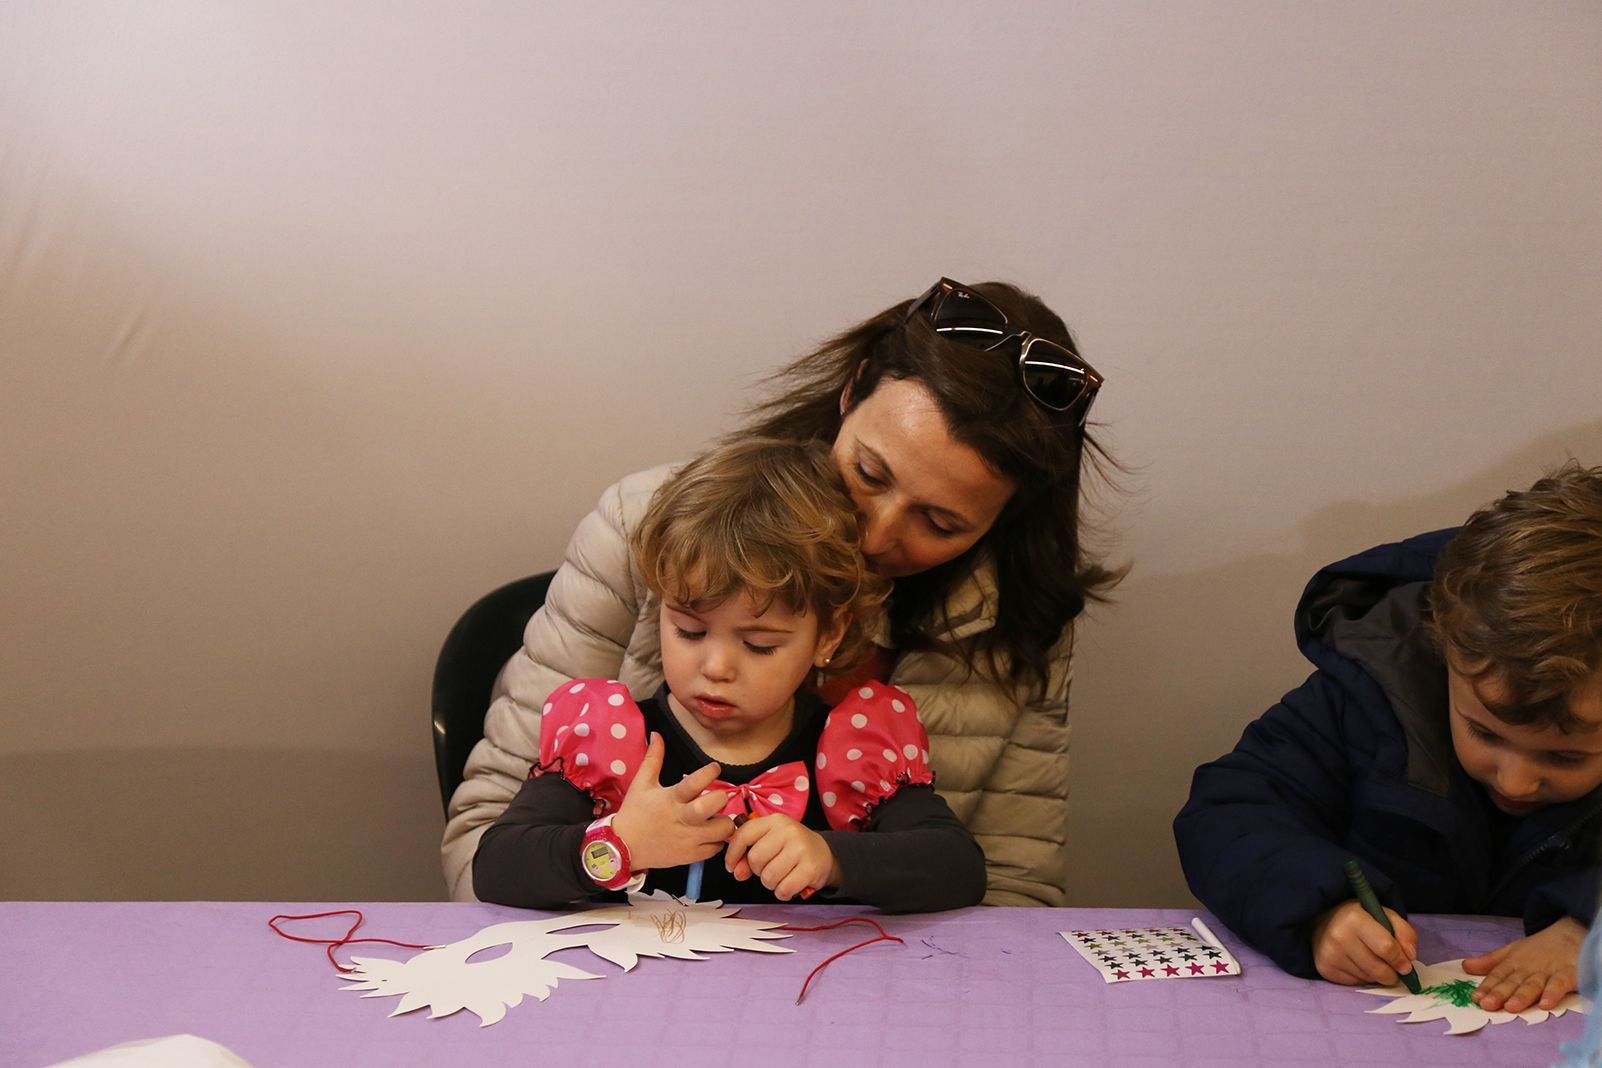 Tallers Infantils a Volpalleres. FOTO: Anna Bassa